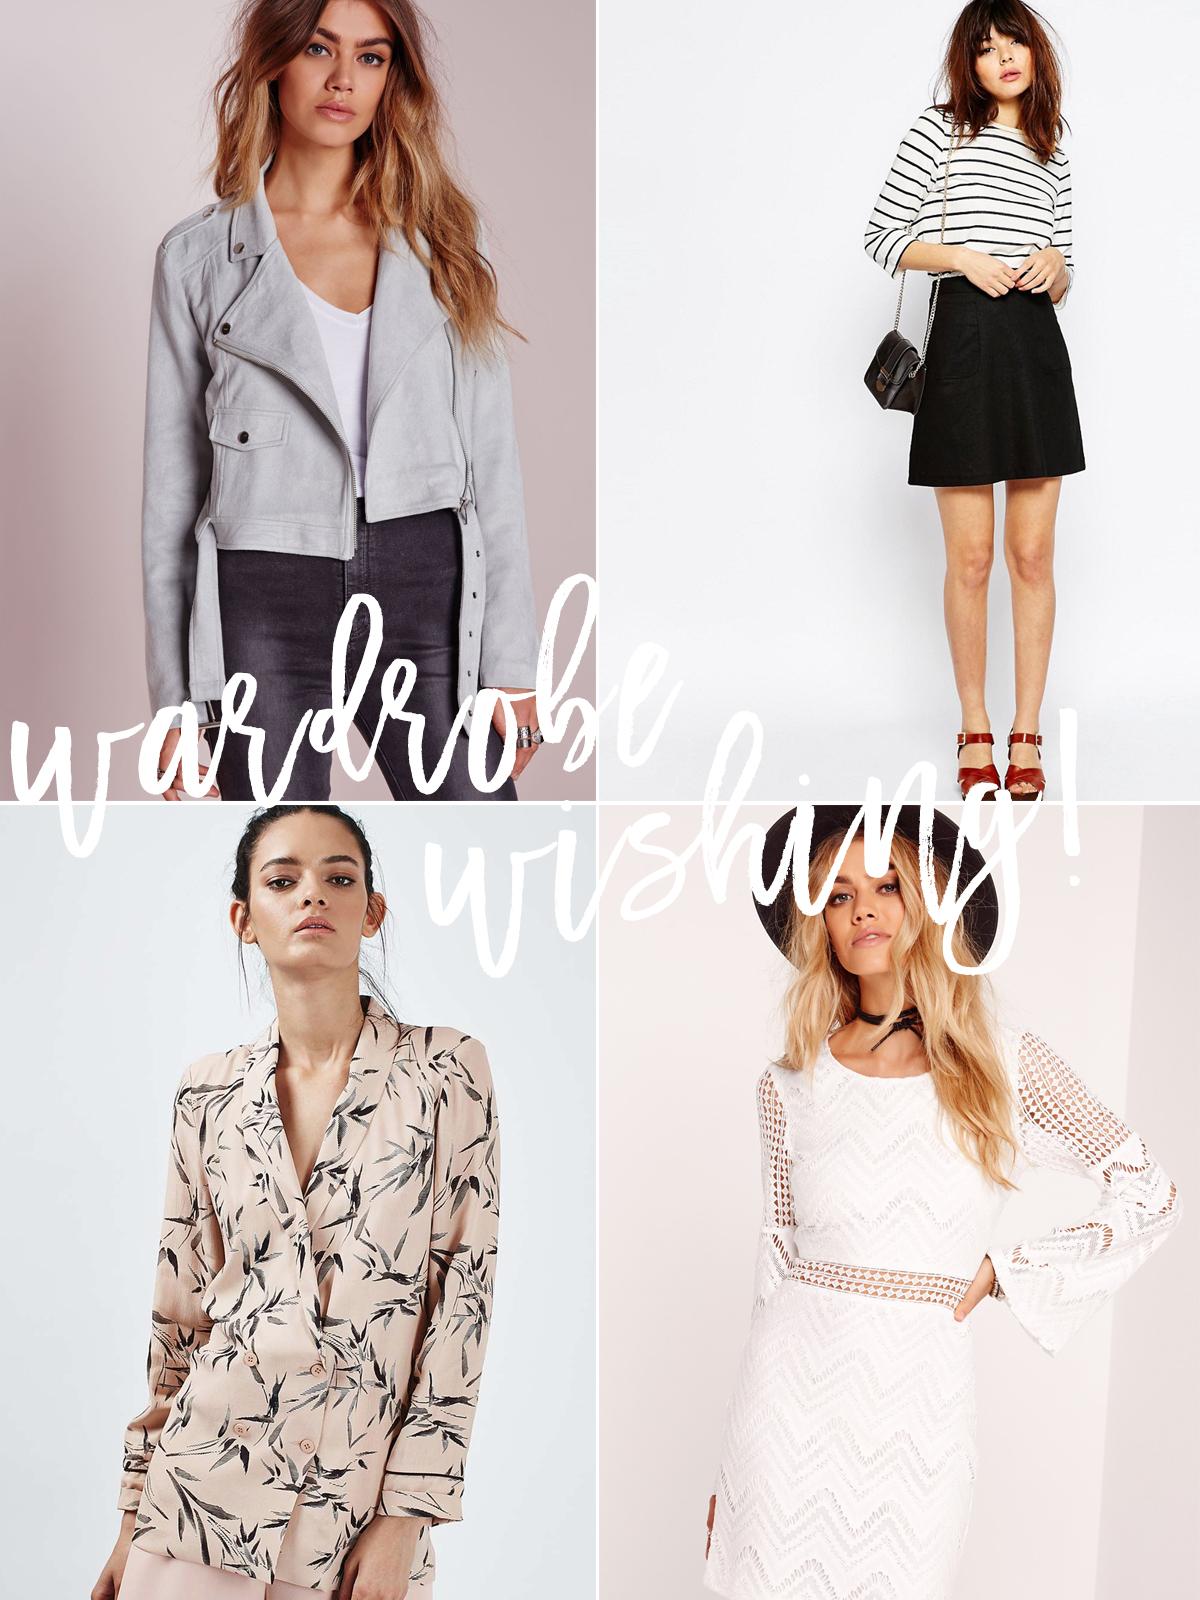 wardrobewish